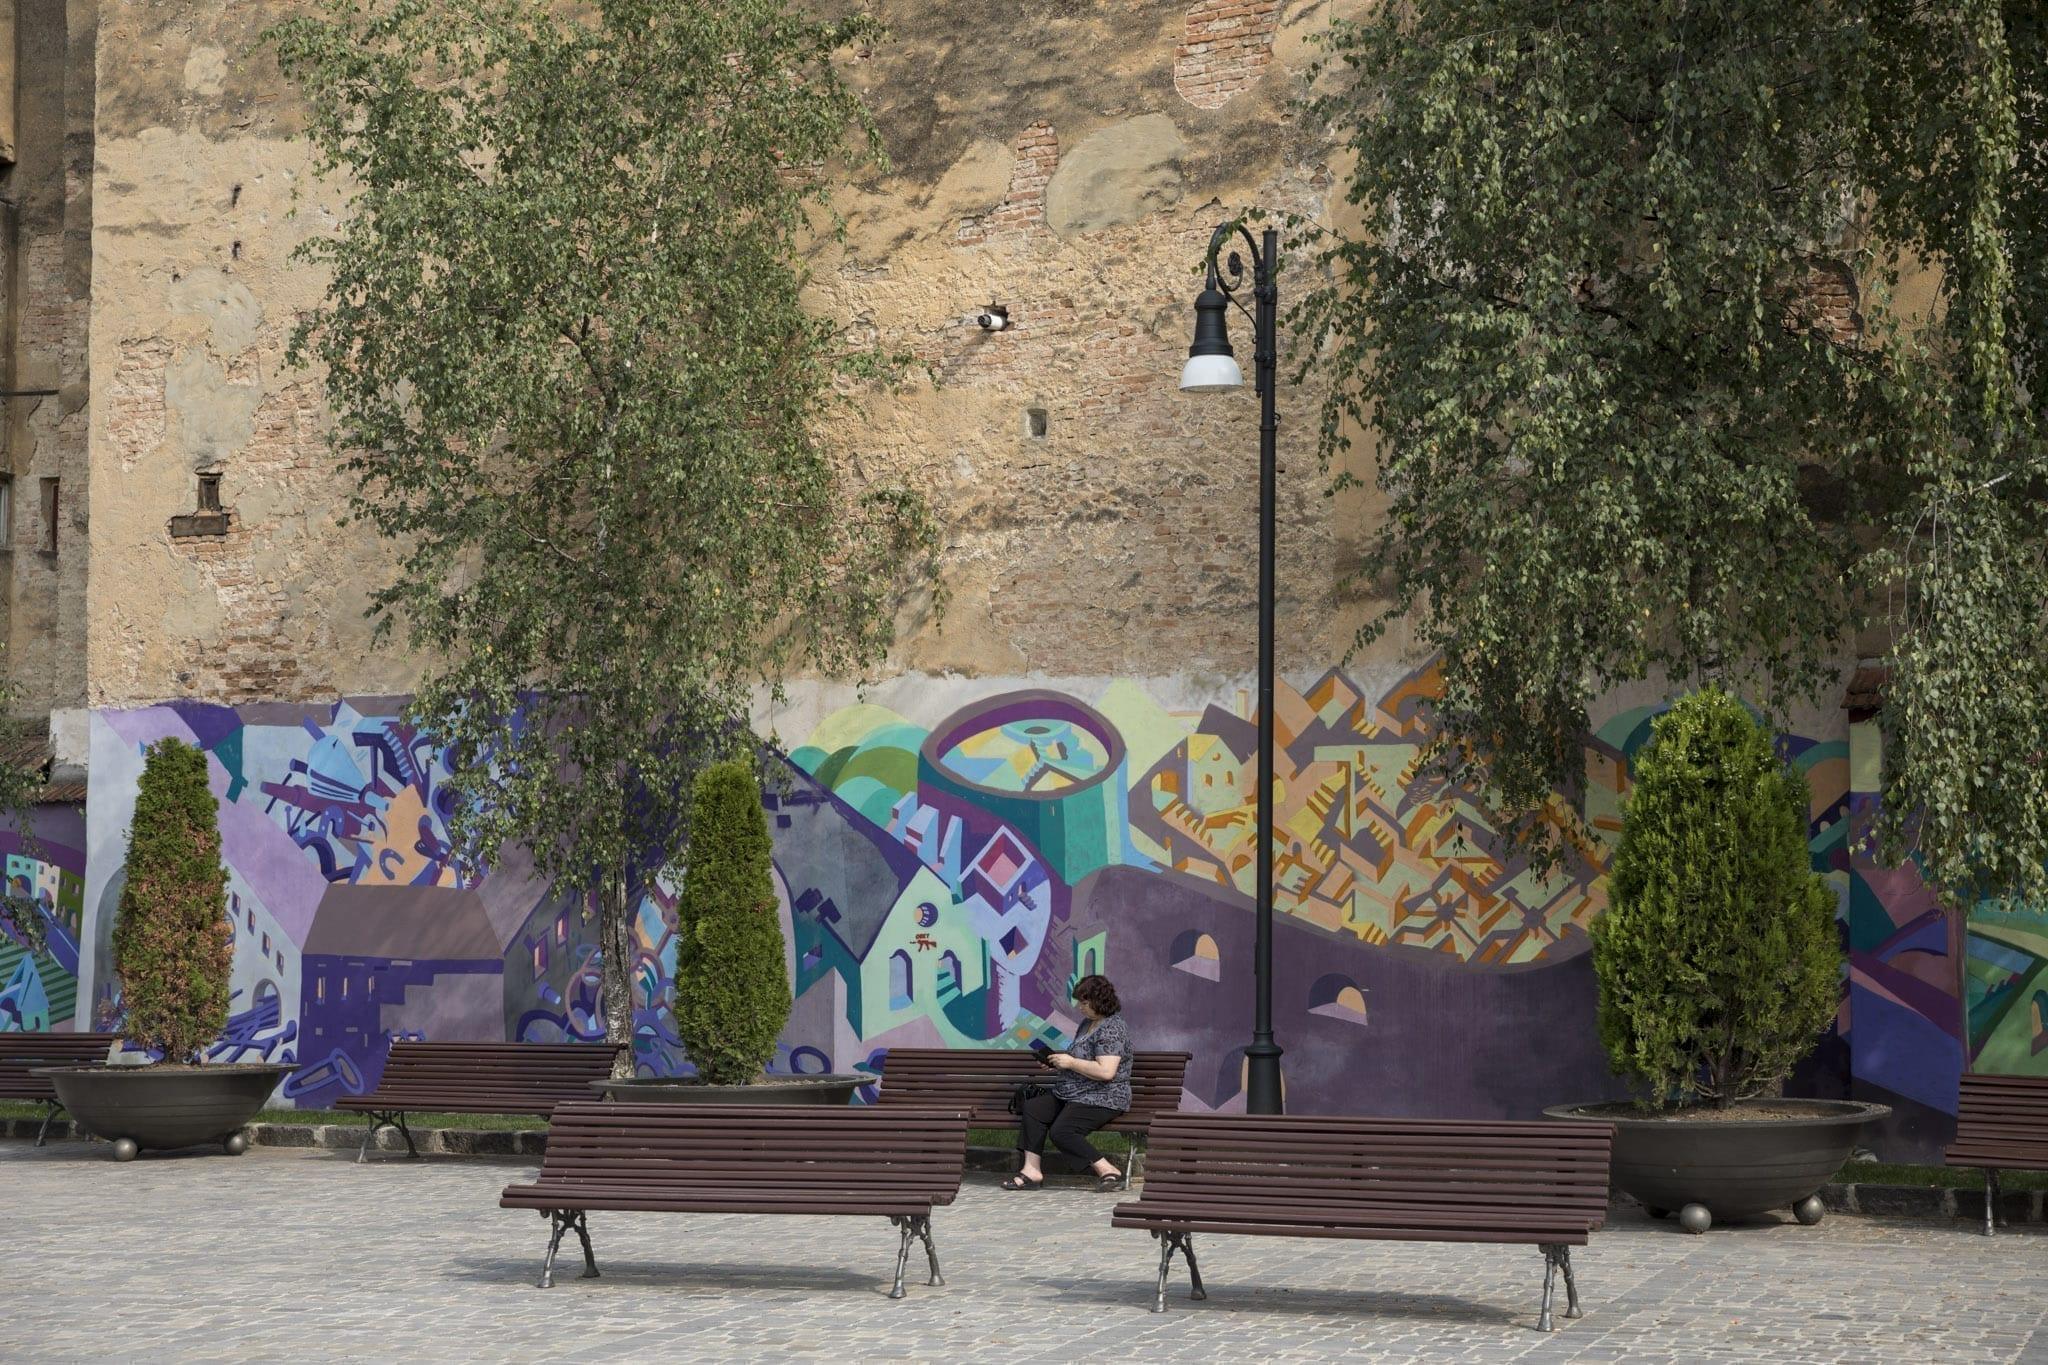 LUCIAN SANDU MILEA & ANA TOMA, KORTE / 2017 Brasov Un-hidden street art in Romania